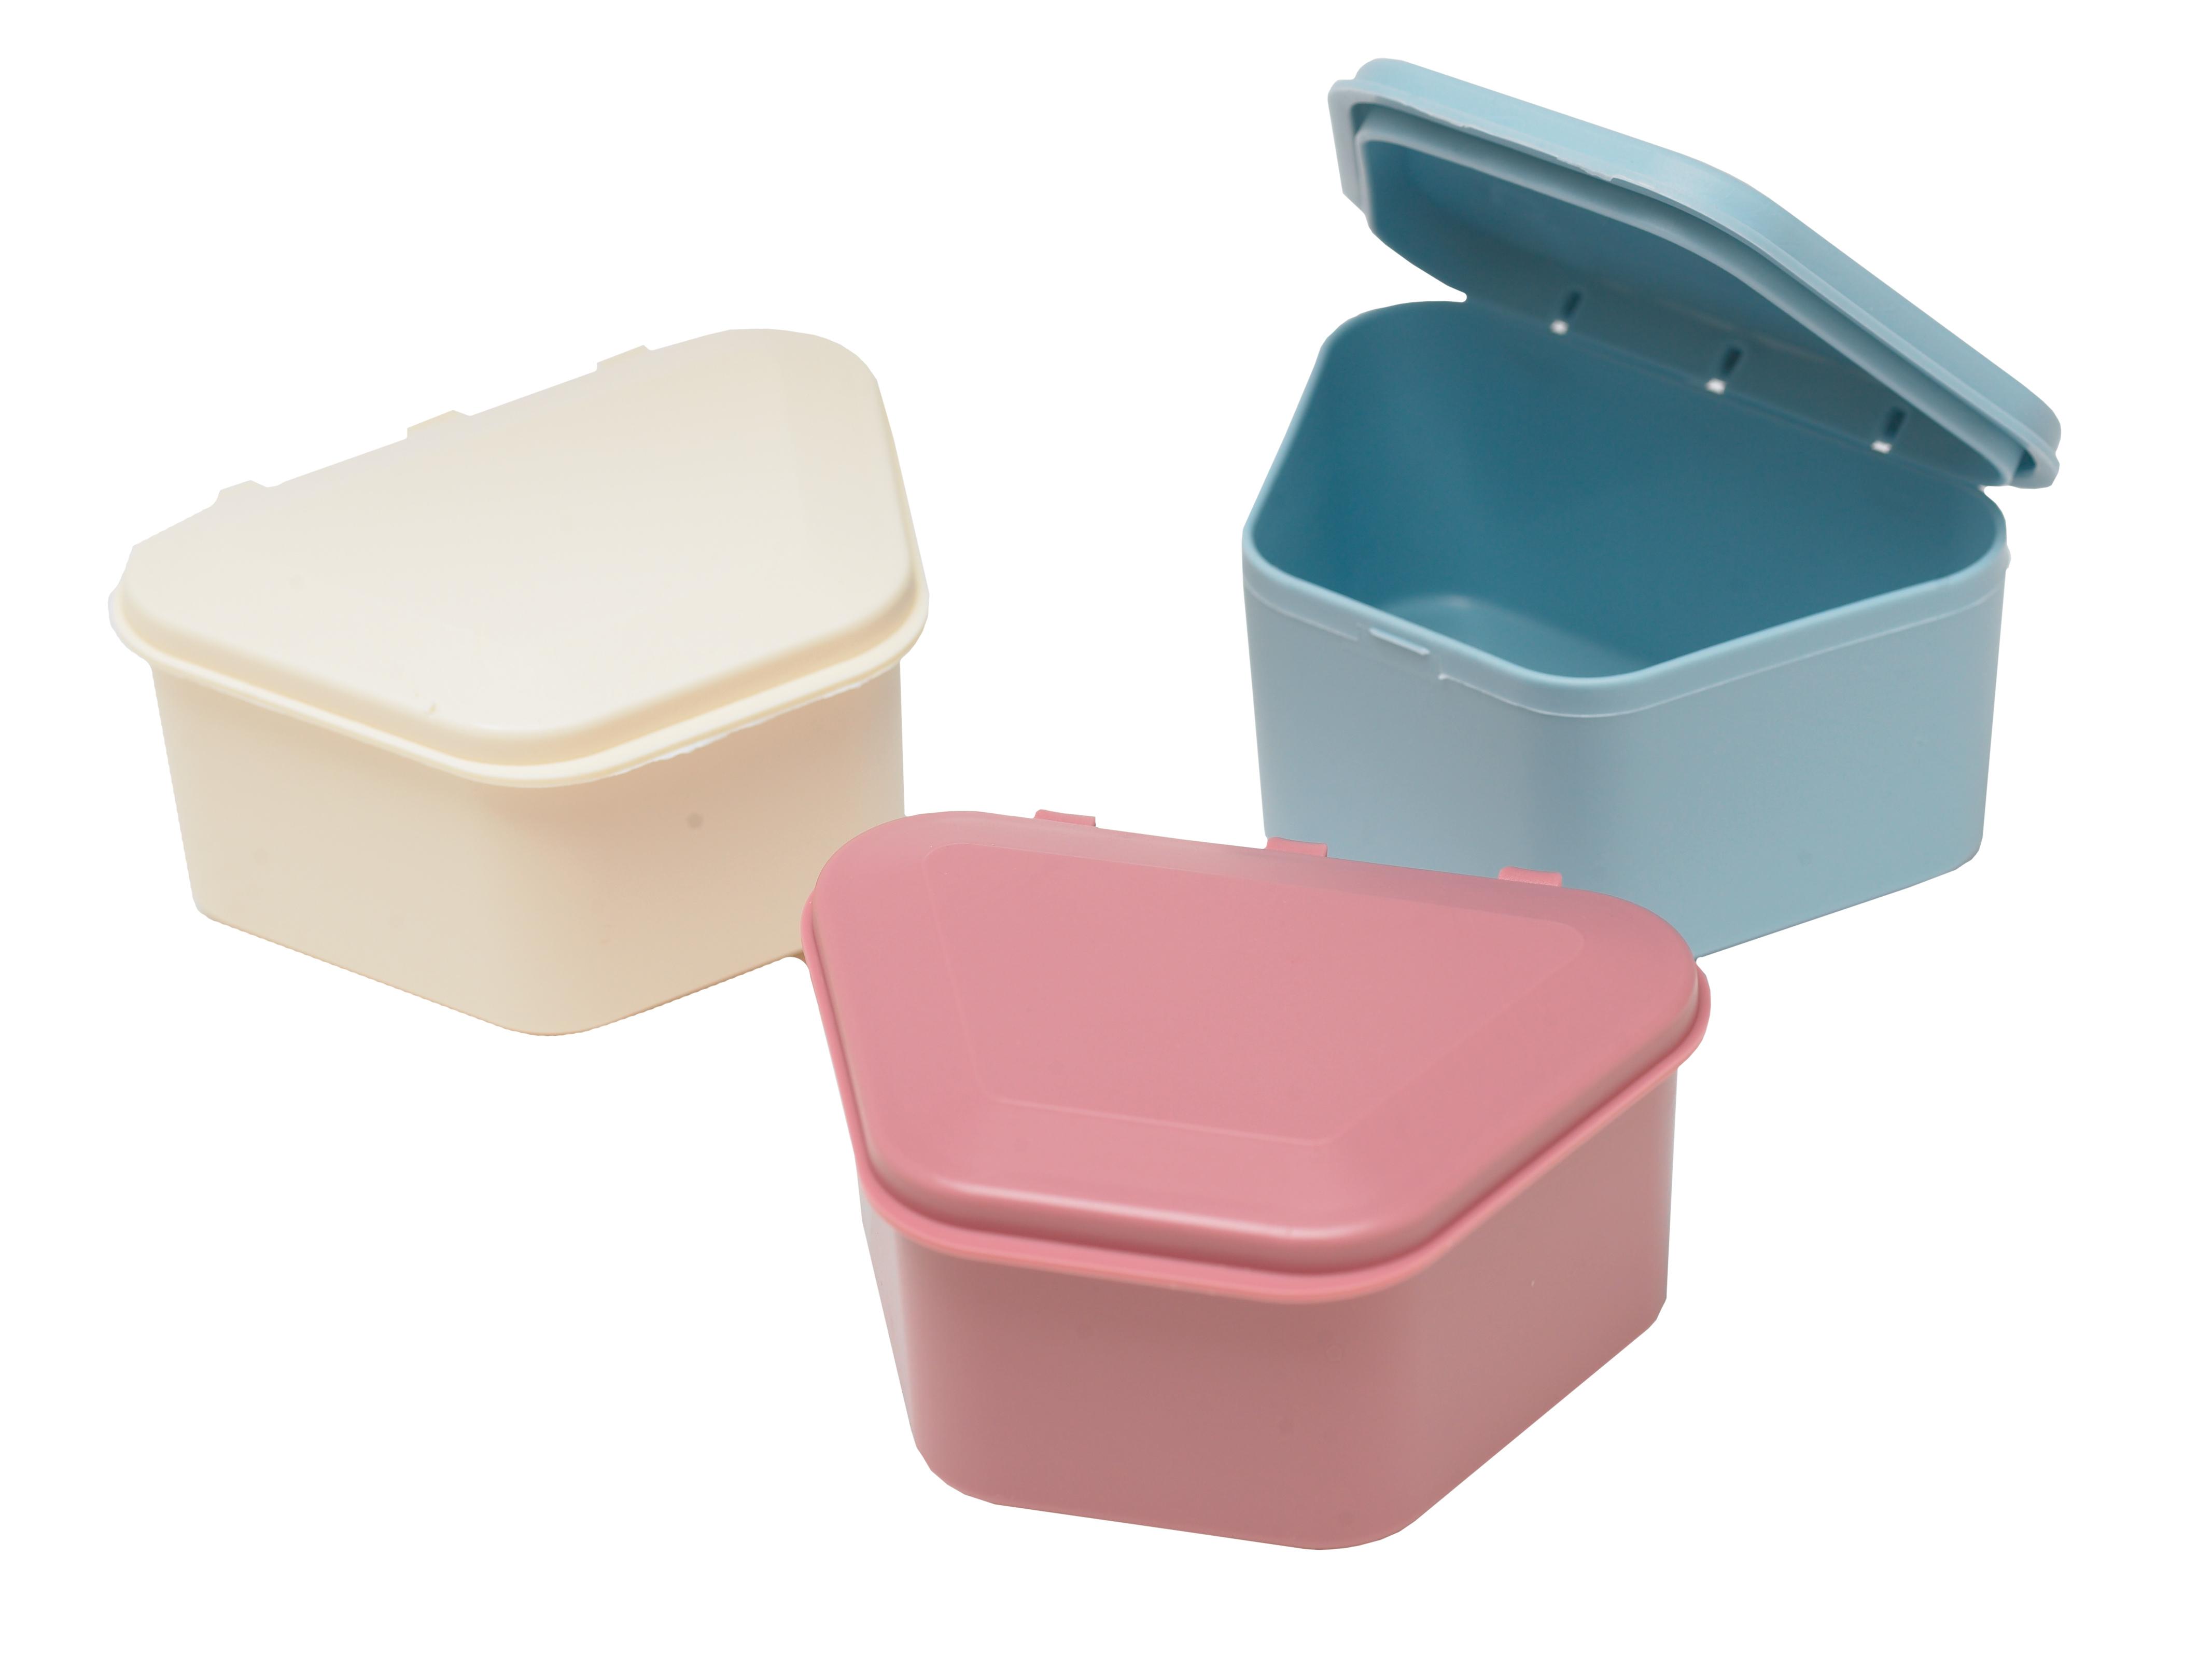 denture-cups-assorted-12-box-017-48534-miltex.jpg